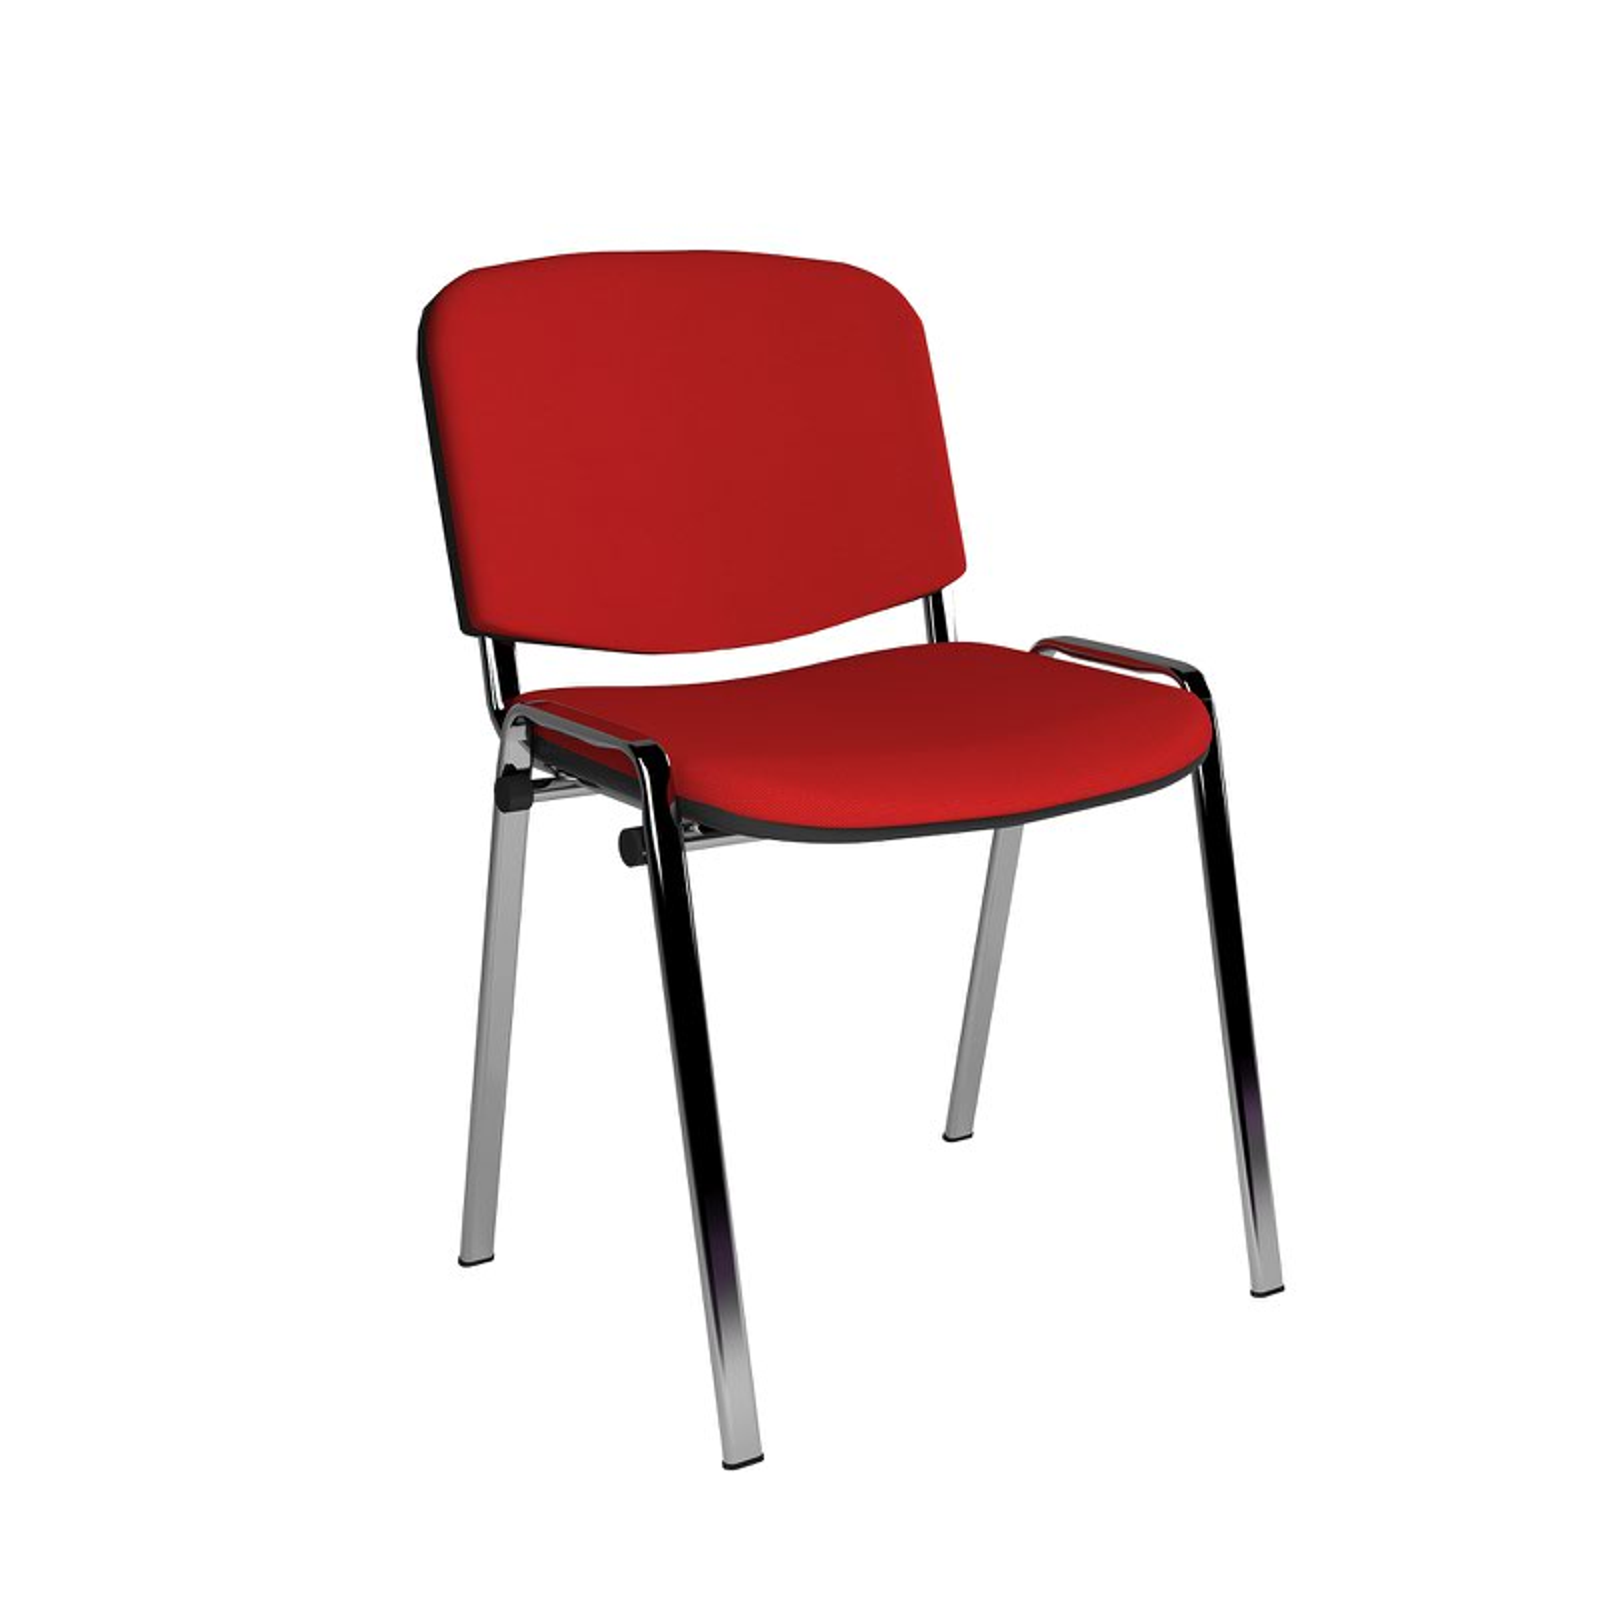 Tobago Stacking Chair Brown Chrome: Taurus Stackable Chair Chrome Four Leg Frame Fabric No